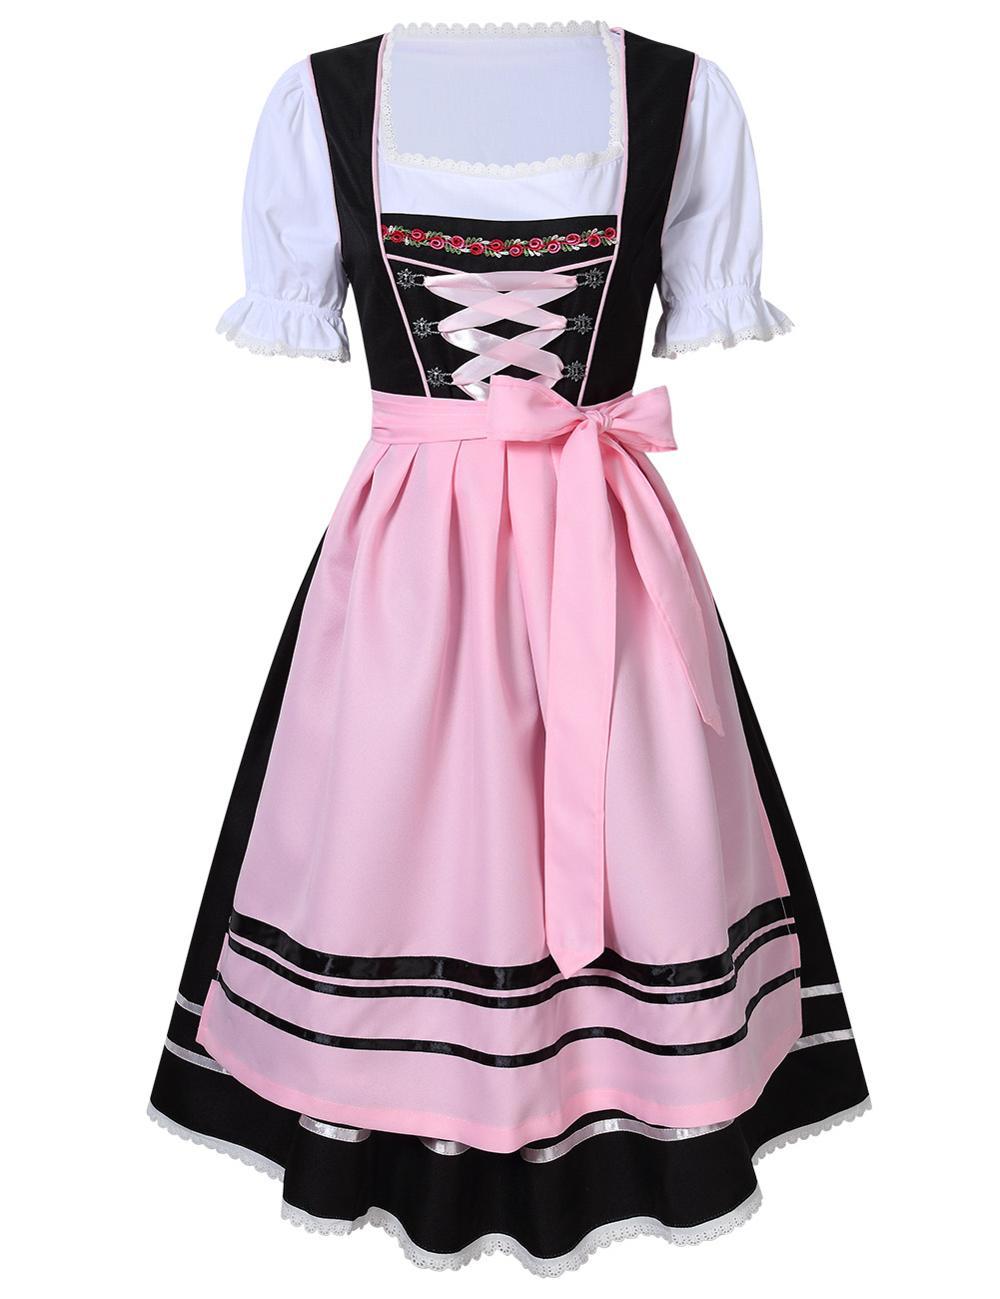 2020 Womens Oktoberfest Beer Girl Costume German Bavarian Traditional Dirndl